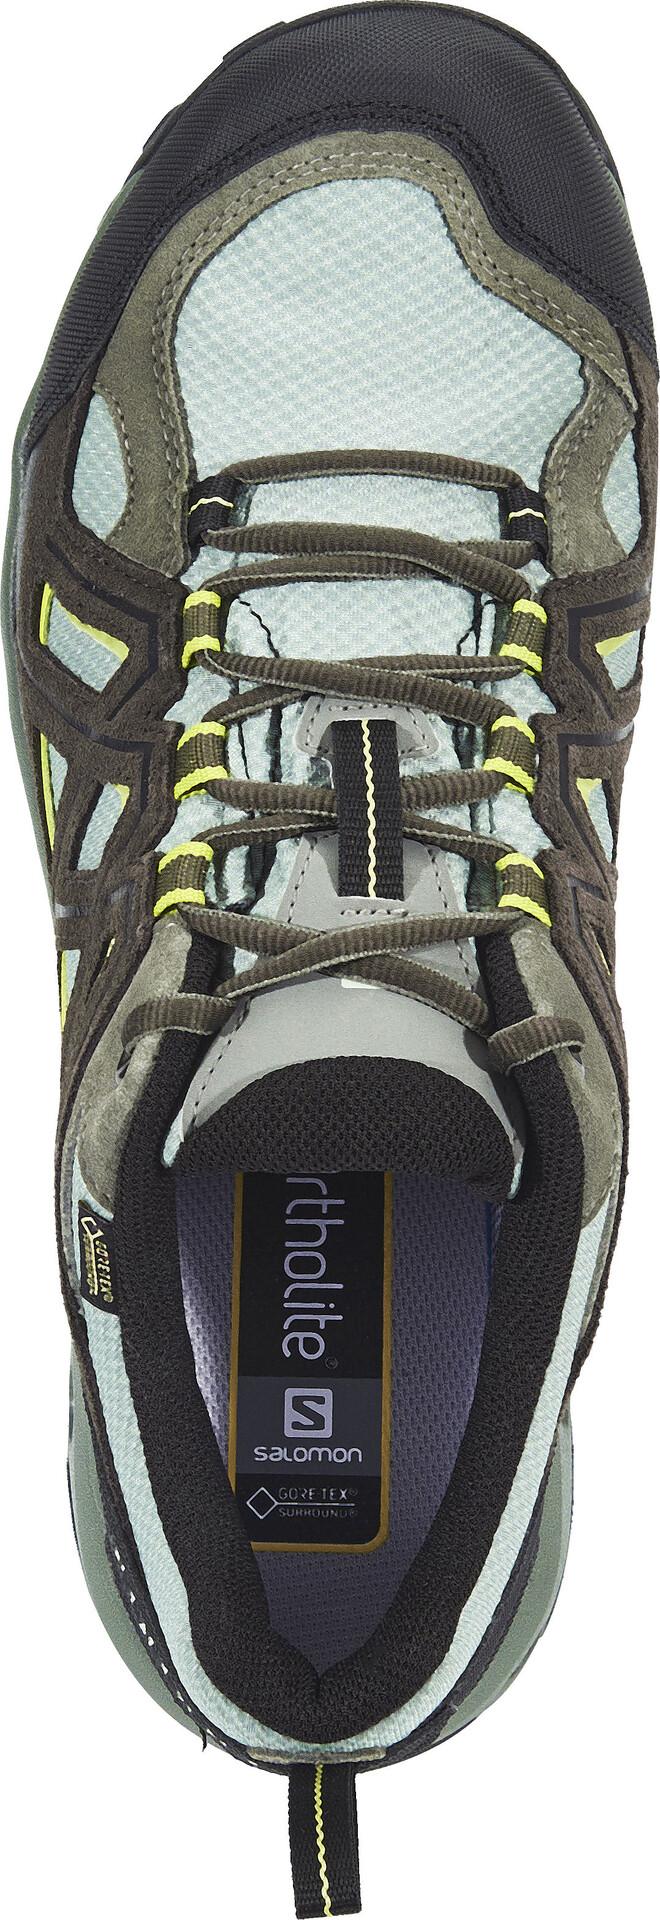 Men Salomon Punch Surround Gtx 2 Shadowbelugalime Shoes